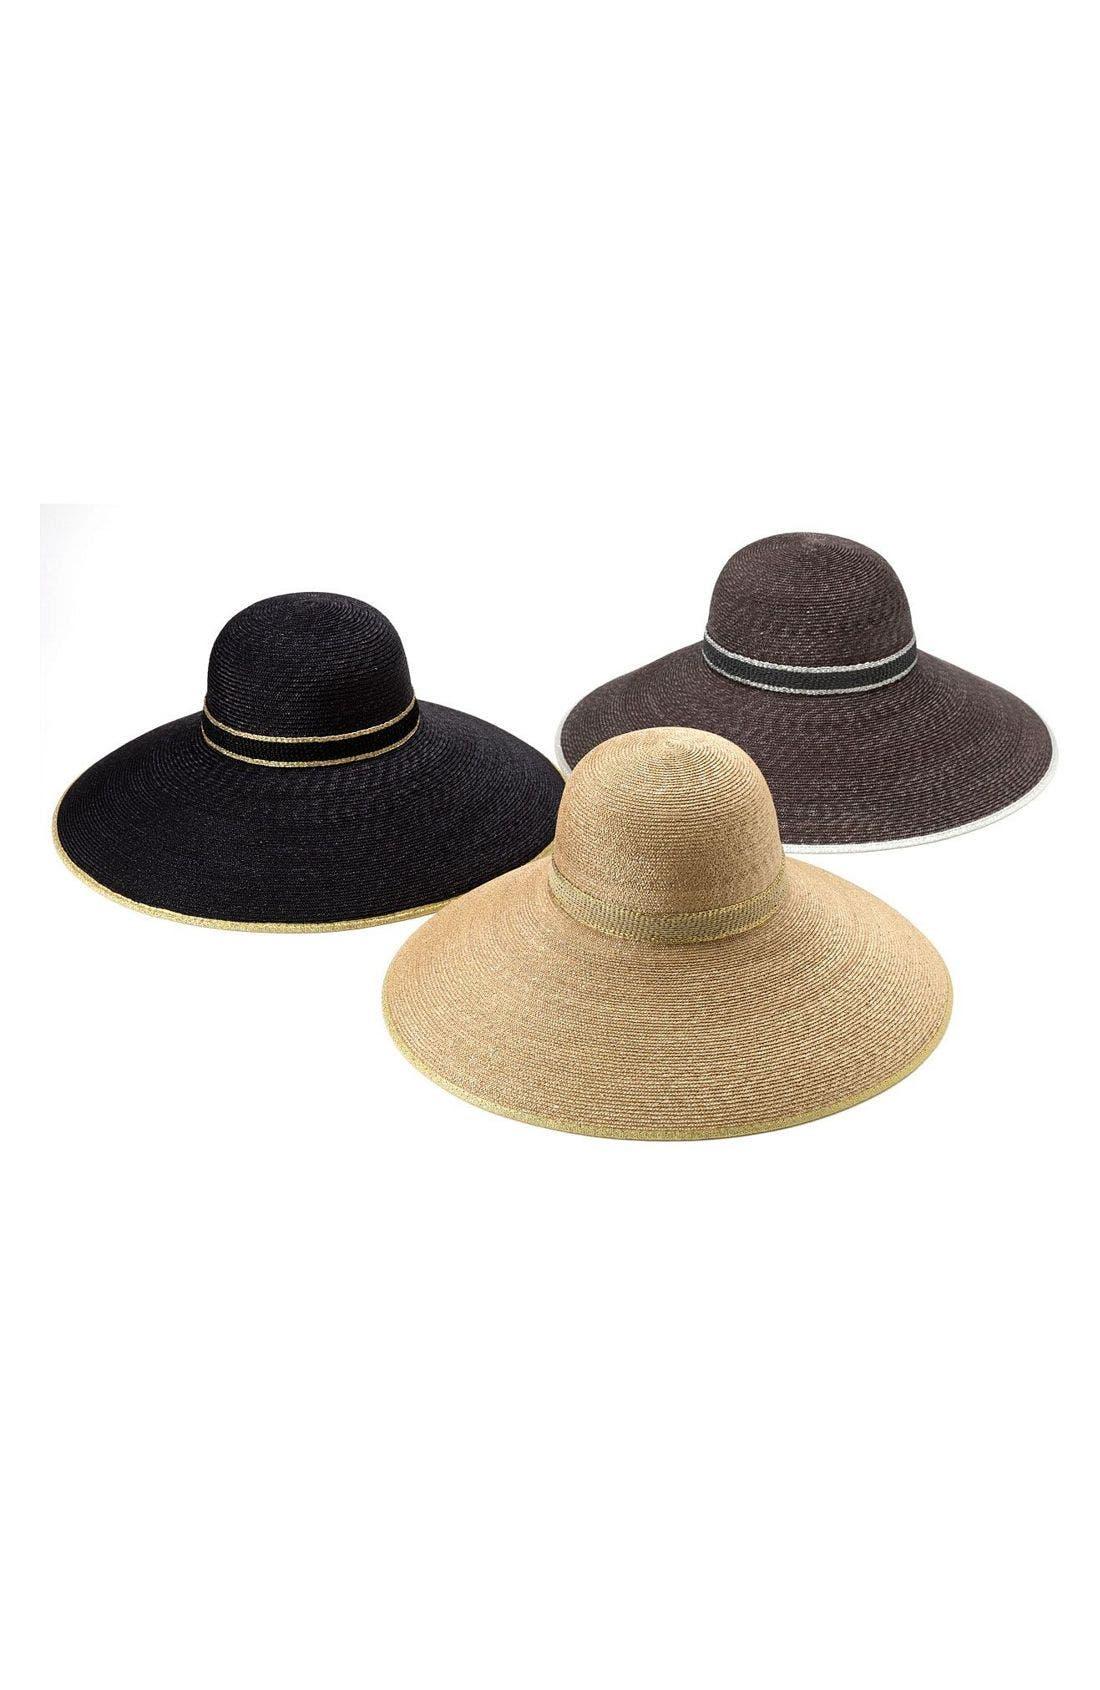 Alternate Image 2  - Nordstrom 'Drama' Metallic Trim Straw Hat